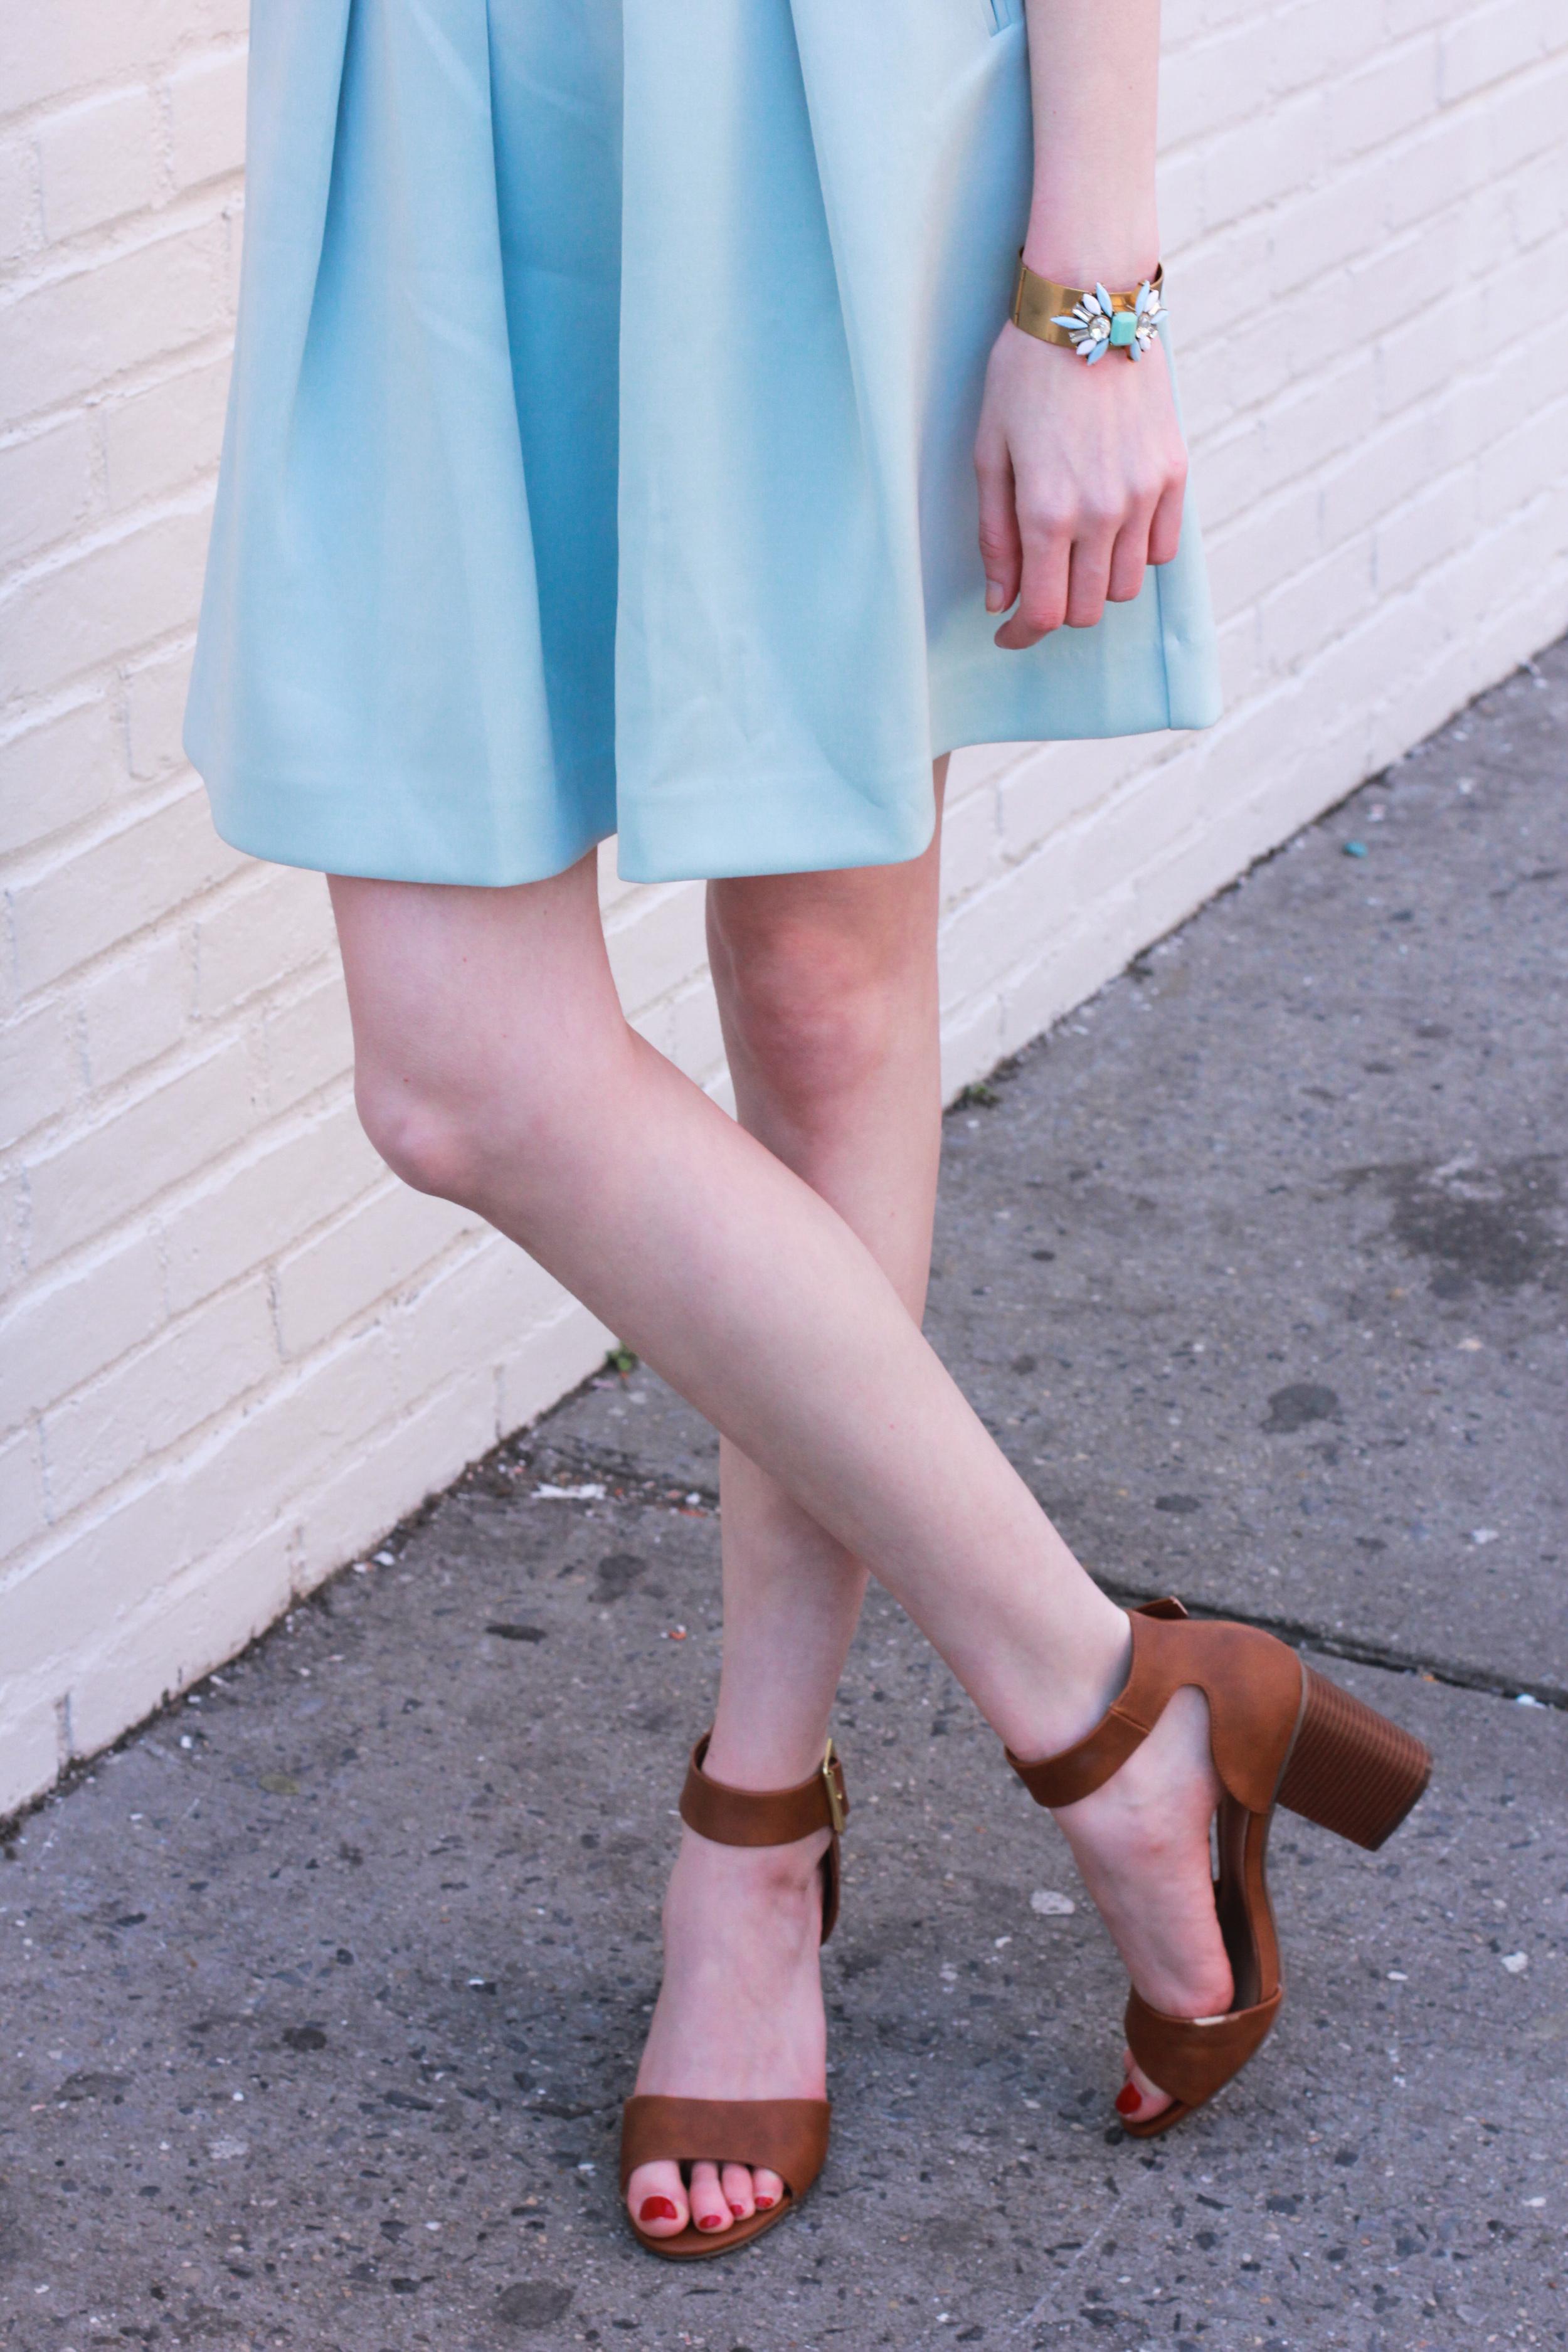 LOFT pleated serenity blue skirt, J.Crew grid windowpane pattern button down, J.Crew gold and jewel cuff, Target brown block heeled sandals, Clinique Love Pop lipcolor